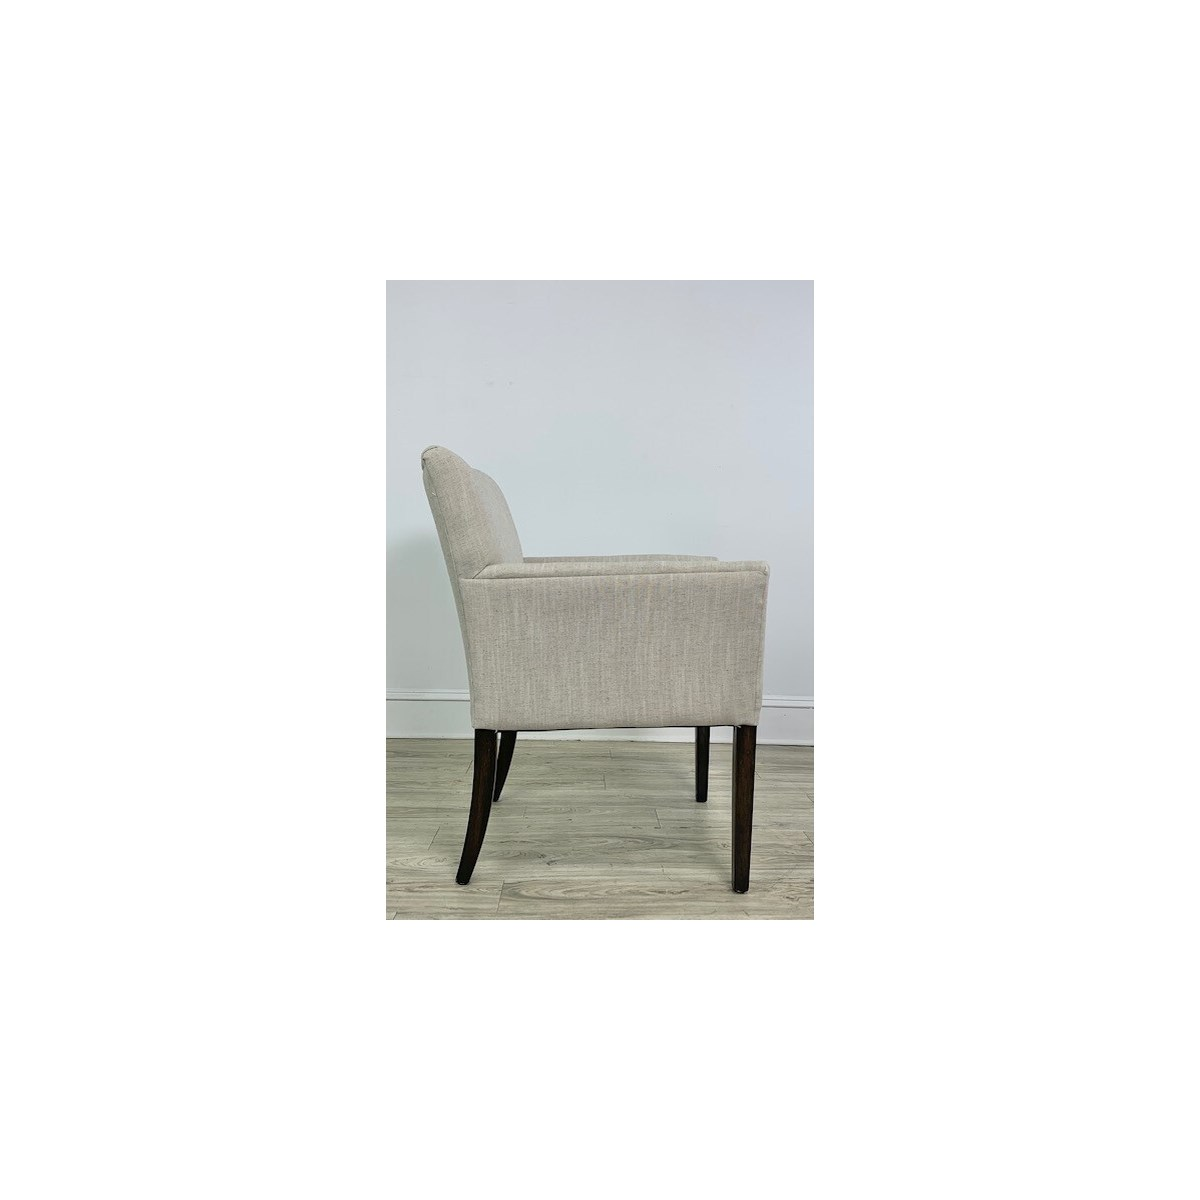 Hudson Arm Chair Siena 901/ Dark Walnut